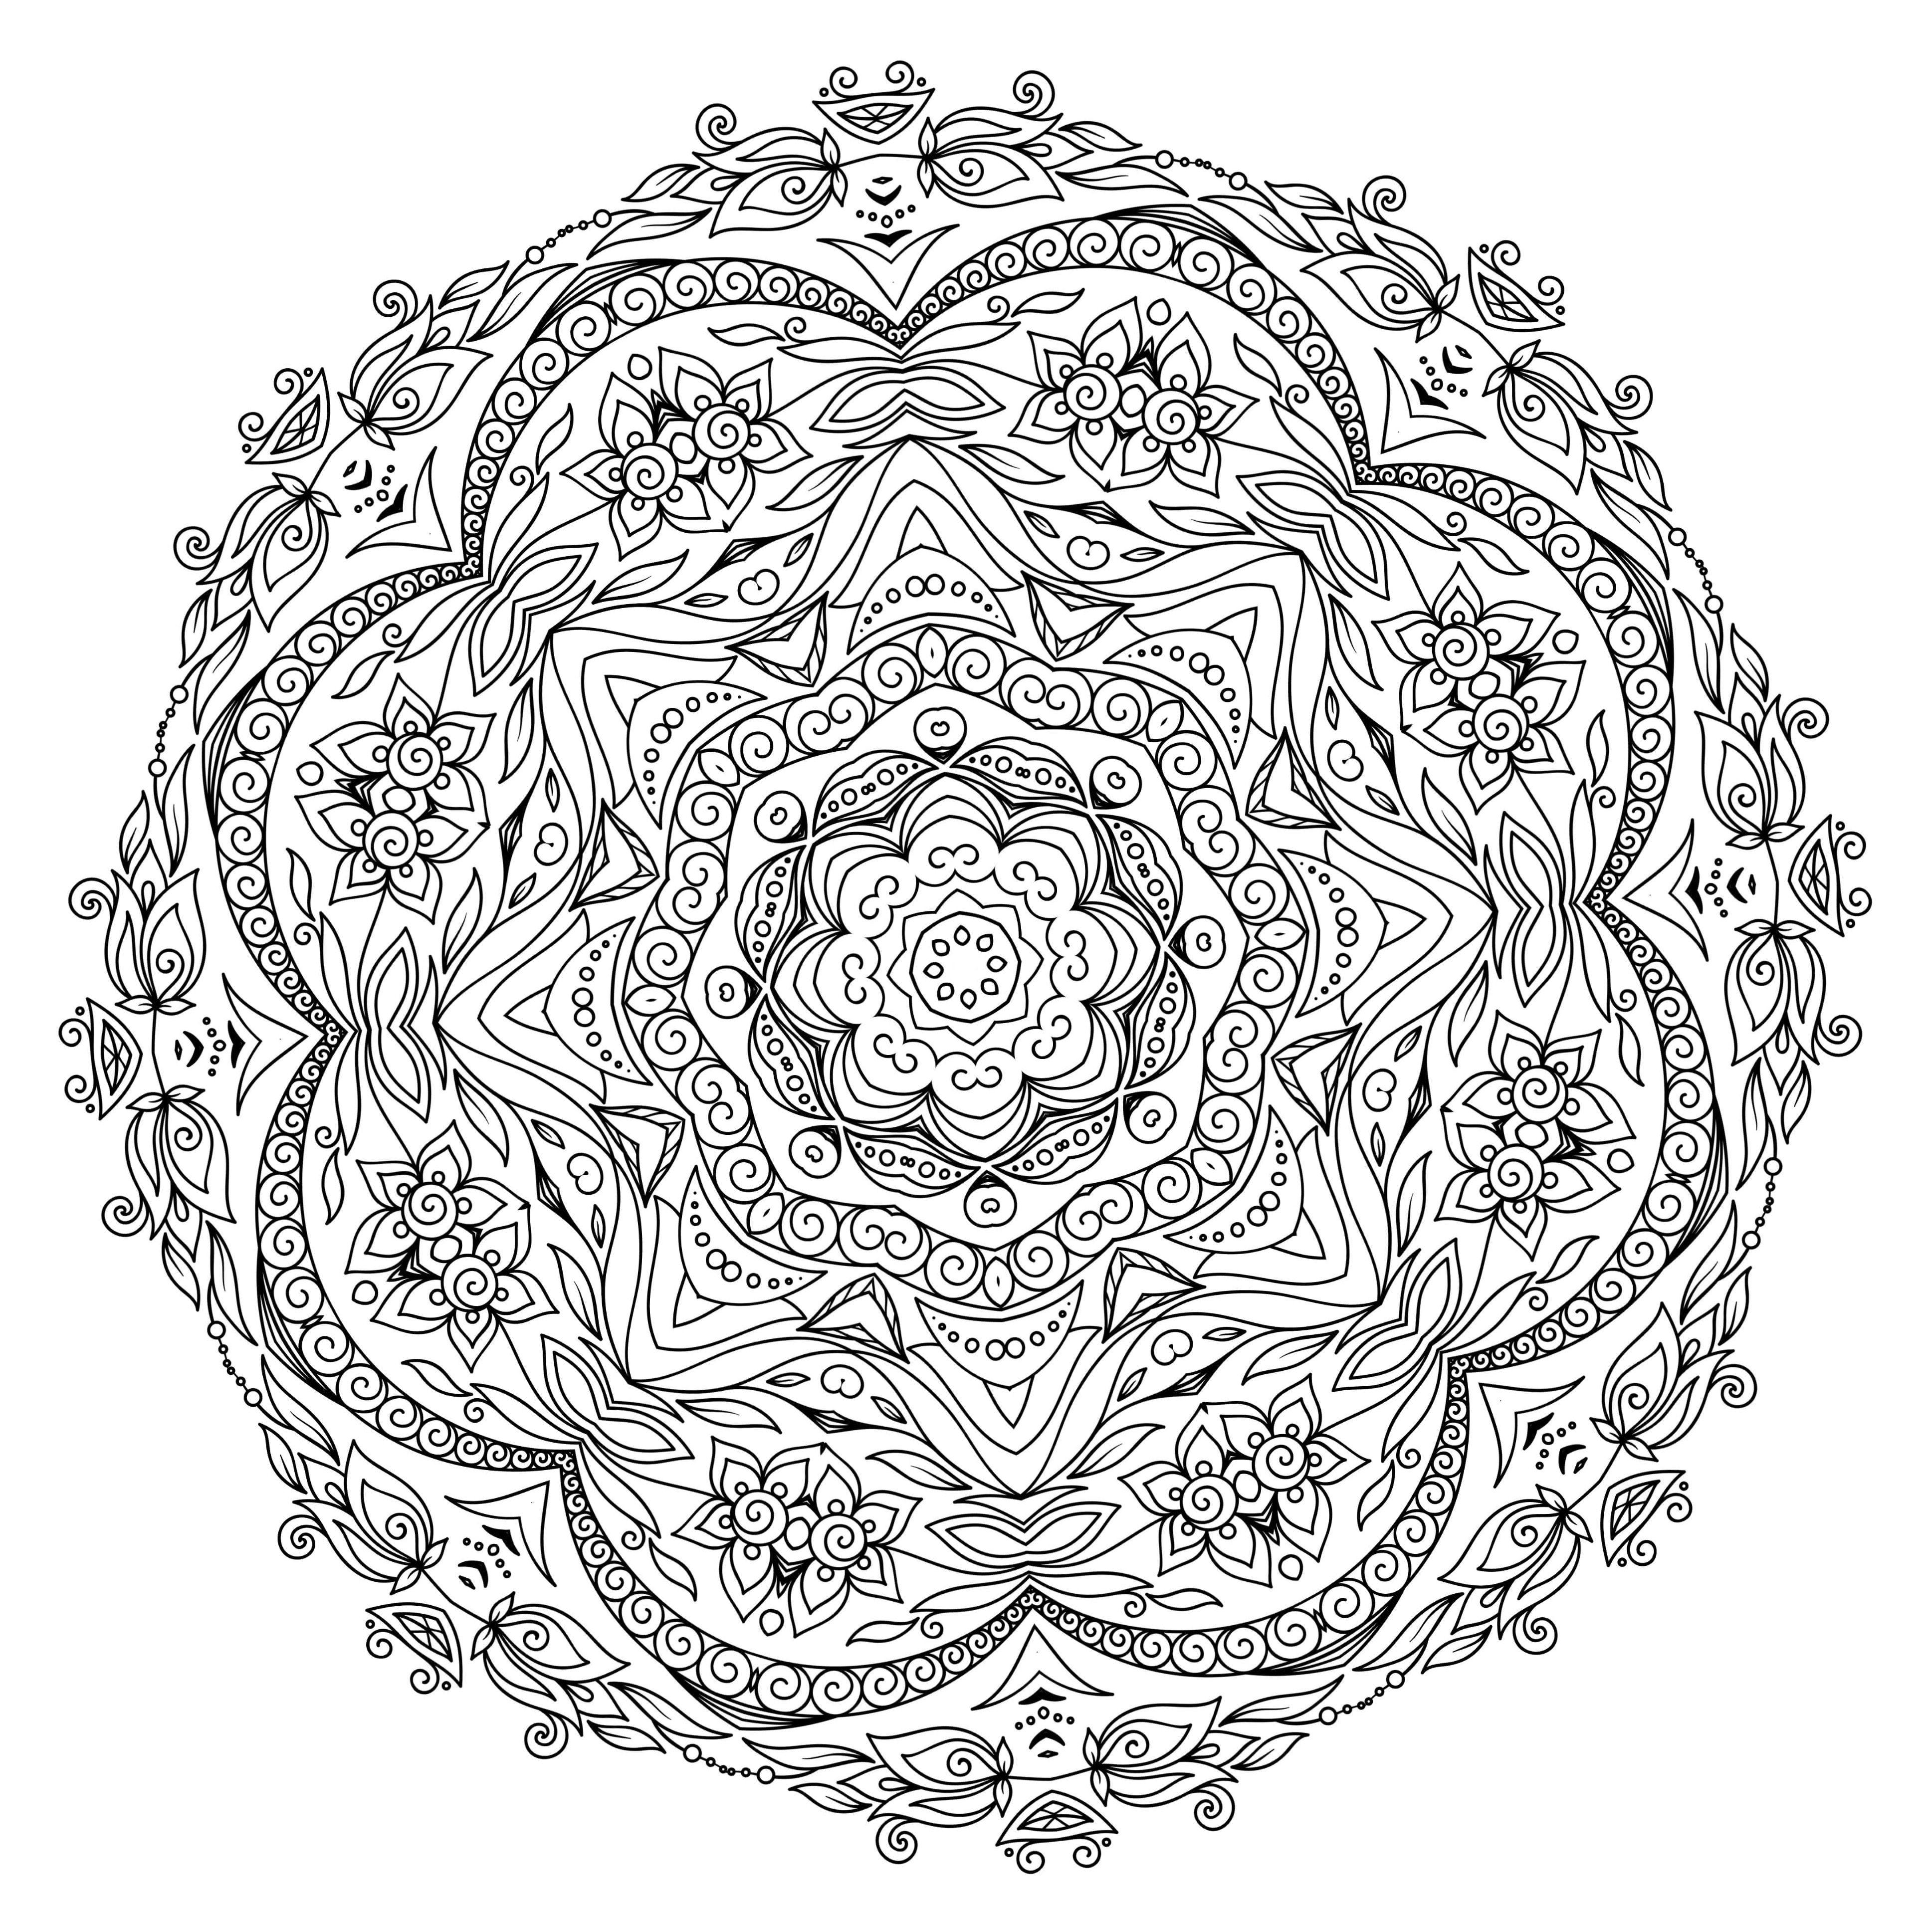 5 Free Printable Coloring Pages: Mandala Templates | Mental Health - Free Printable Mandalas